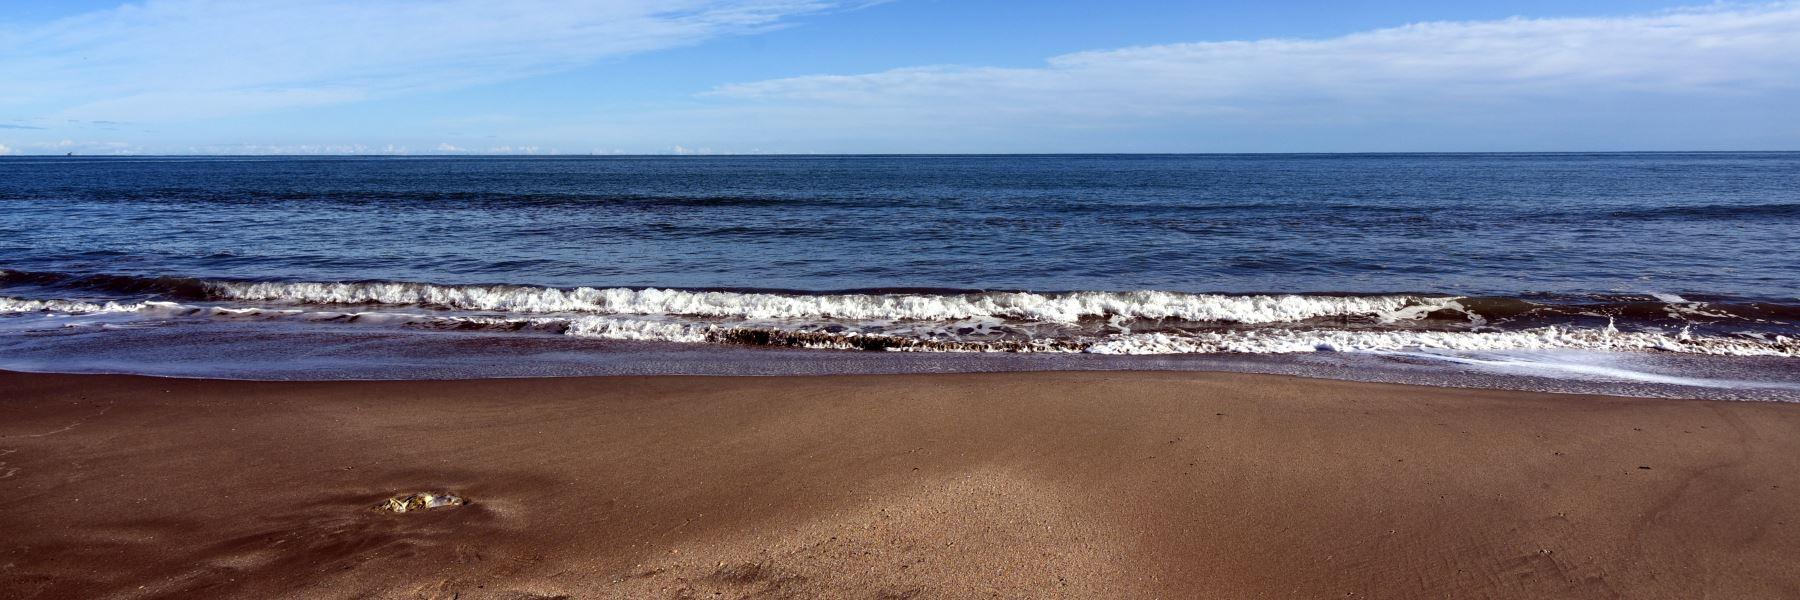 Mare d'inverno  - DE